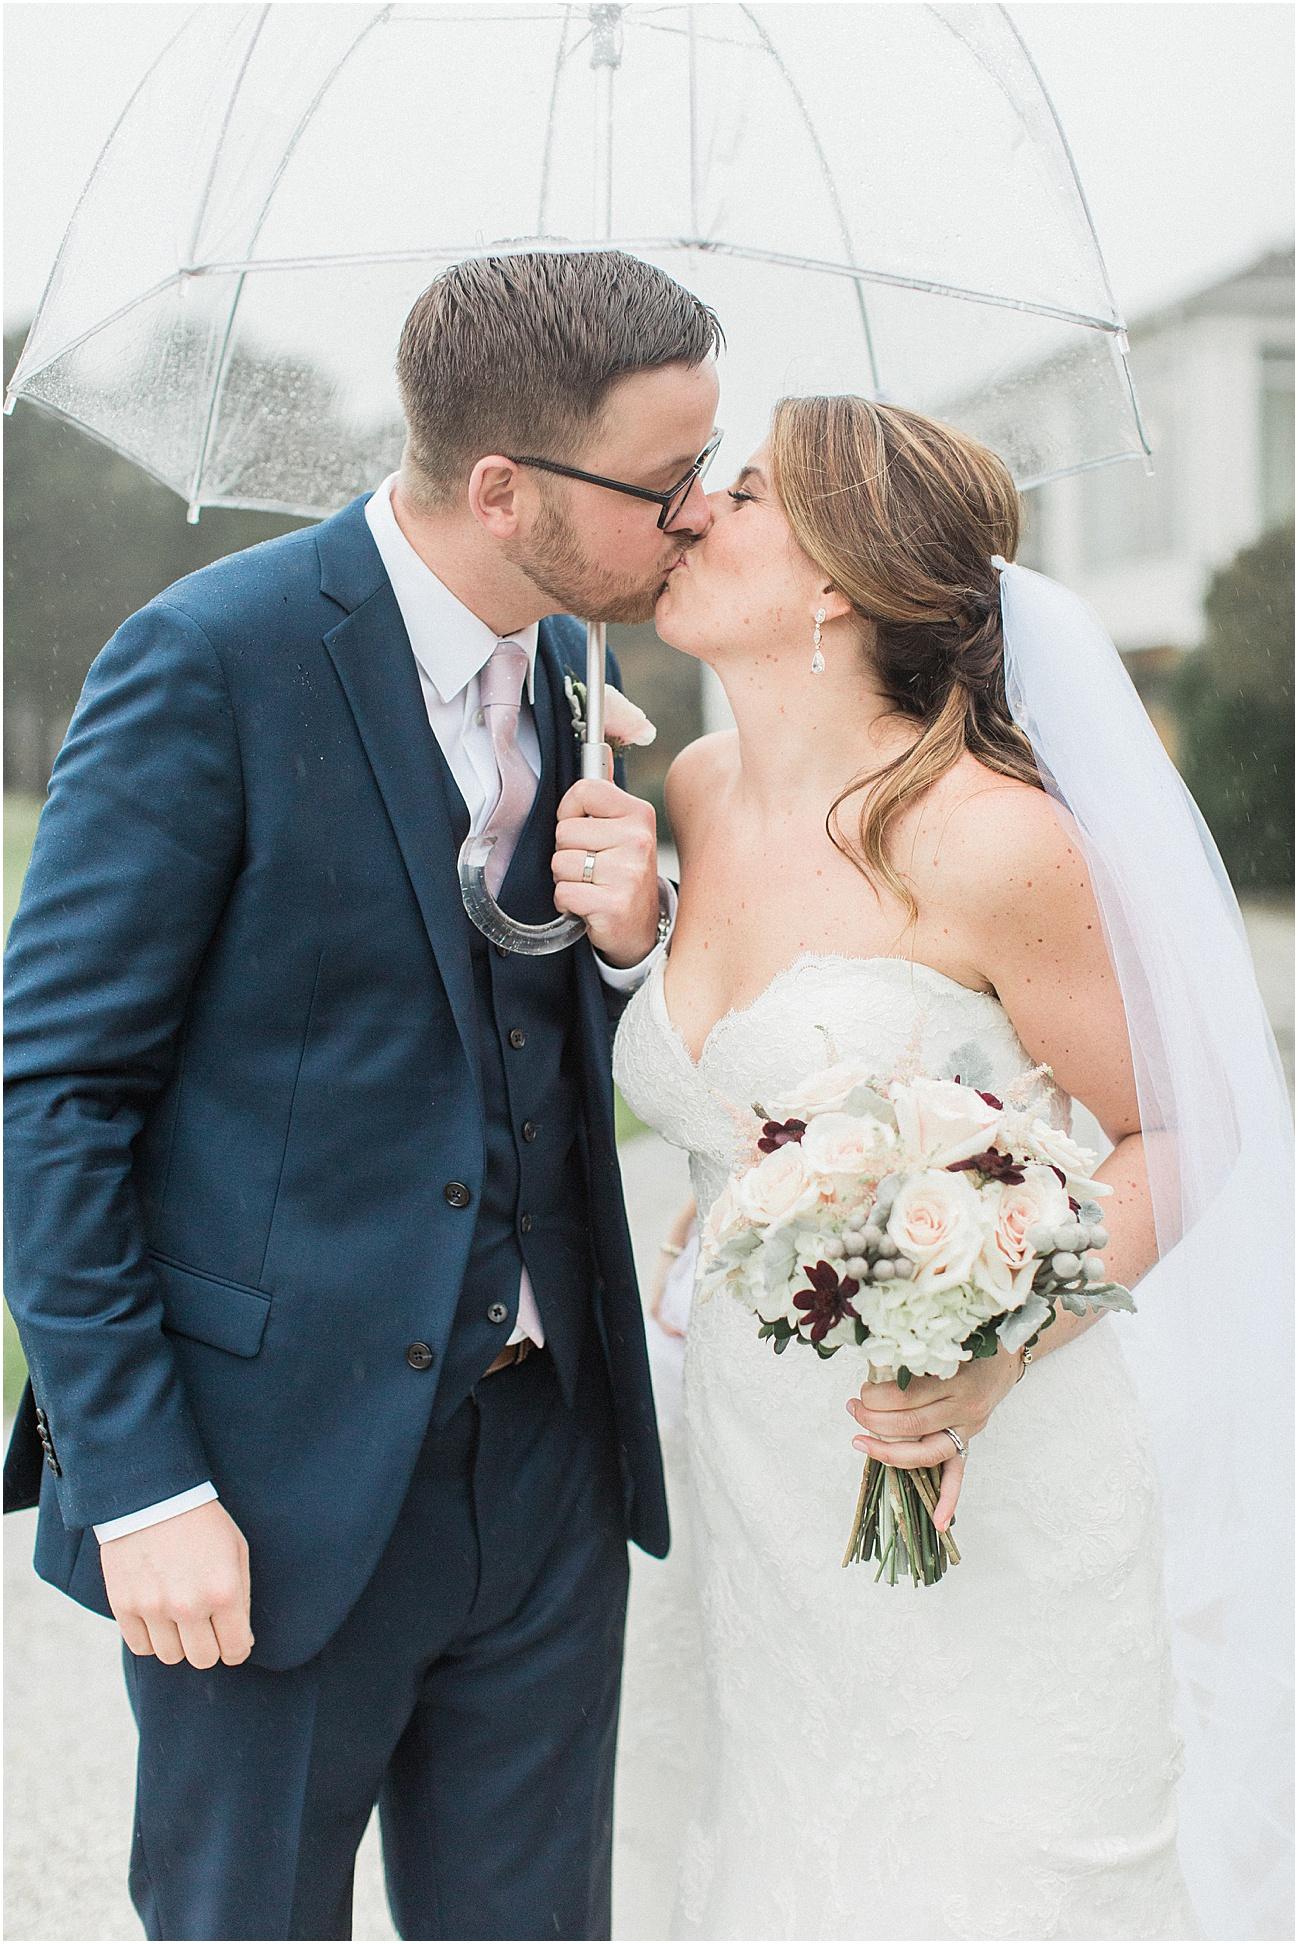 danielle_sean_willowbend_rain_rainy_day_cape_cod_boston_wedding_photographer_meredith_jane_photography_photo_1694.jpg